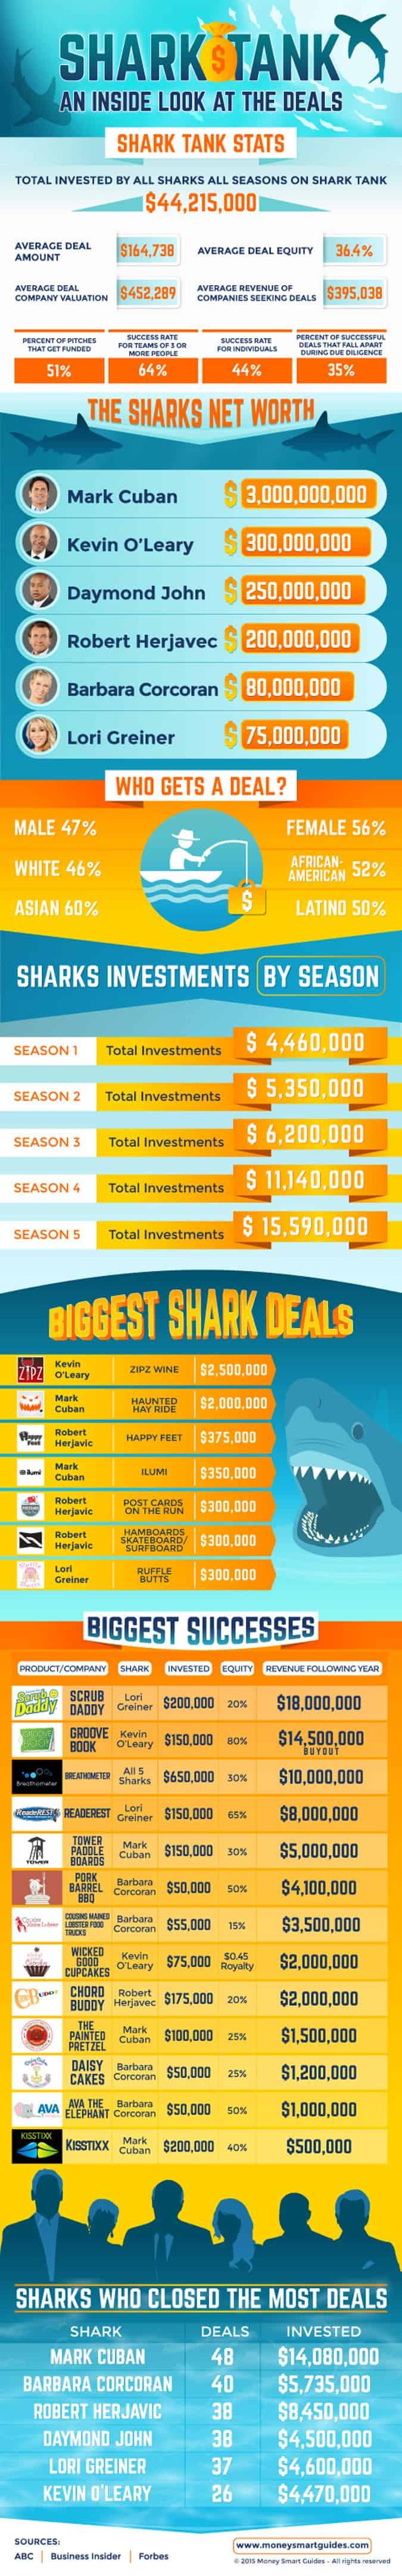 shark tank infographic